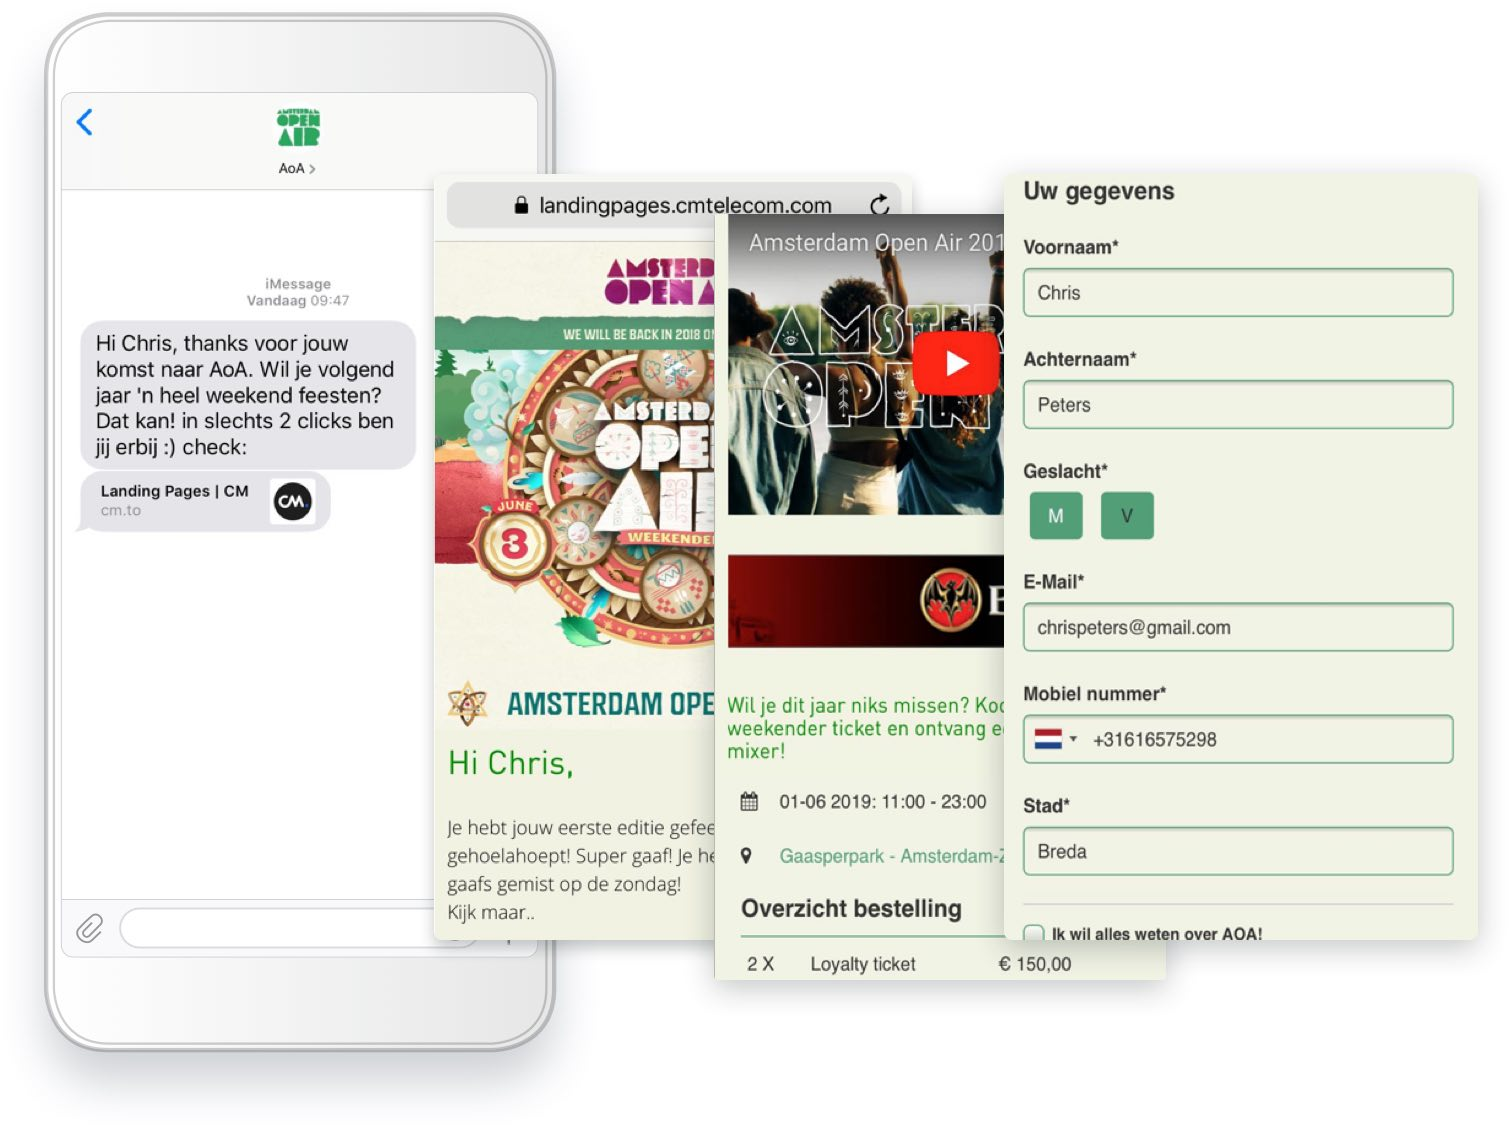 Example Kingdance chatbot cm.com